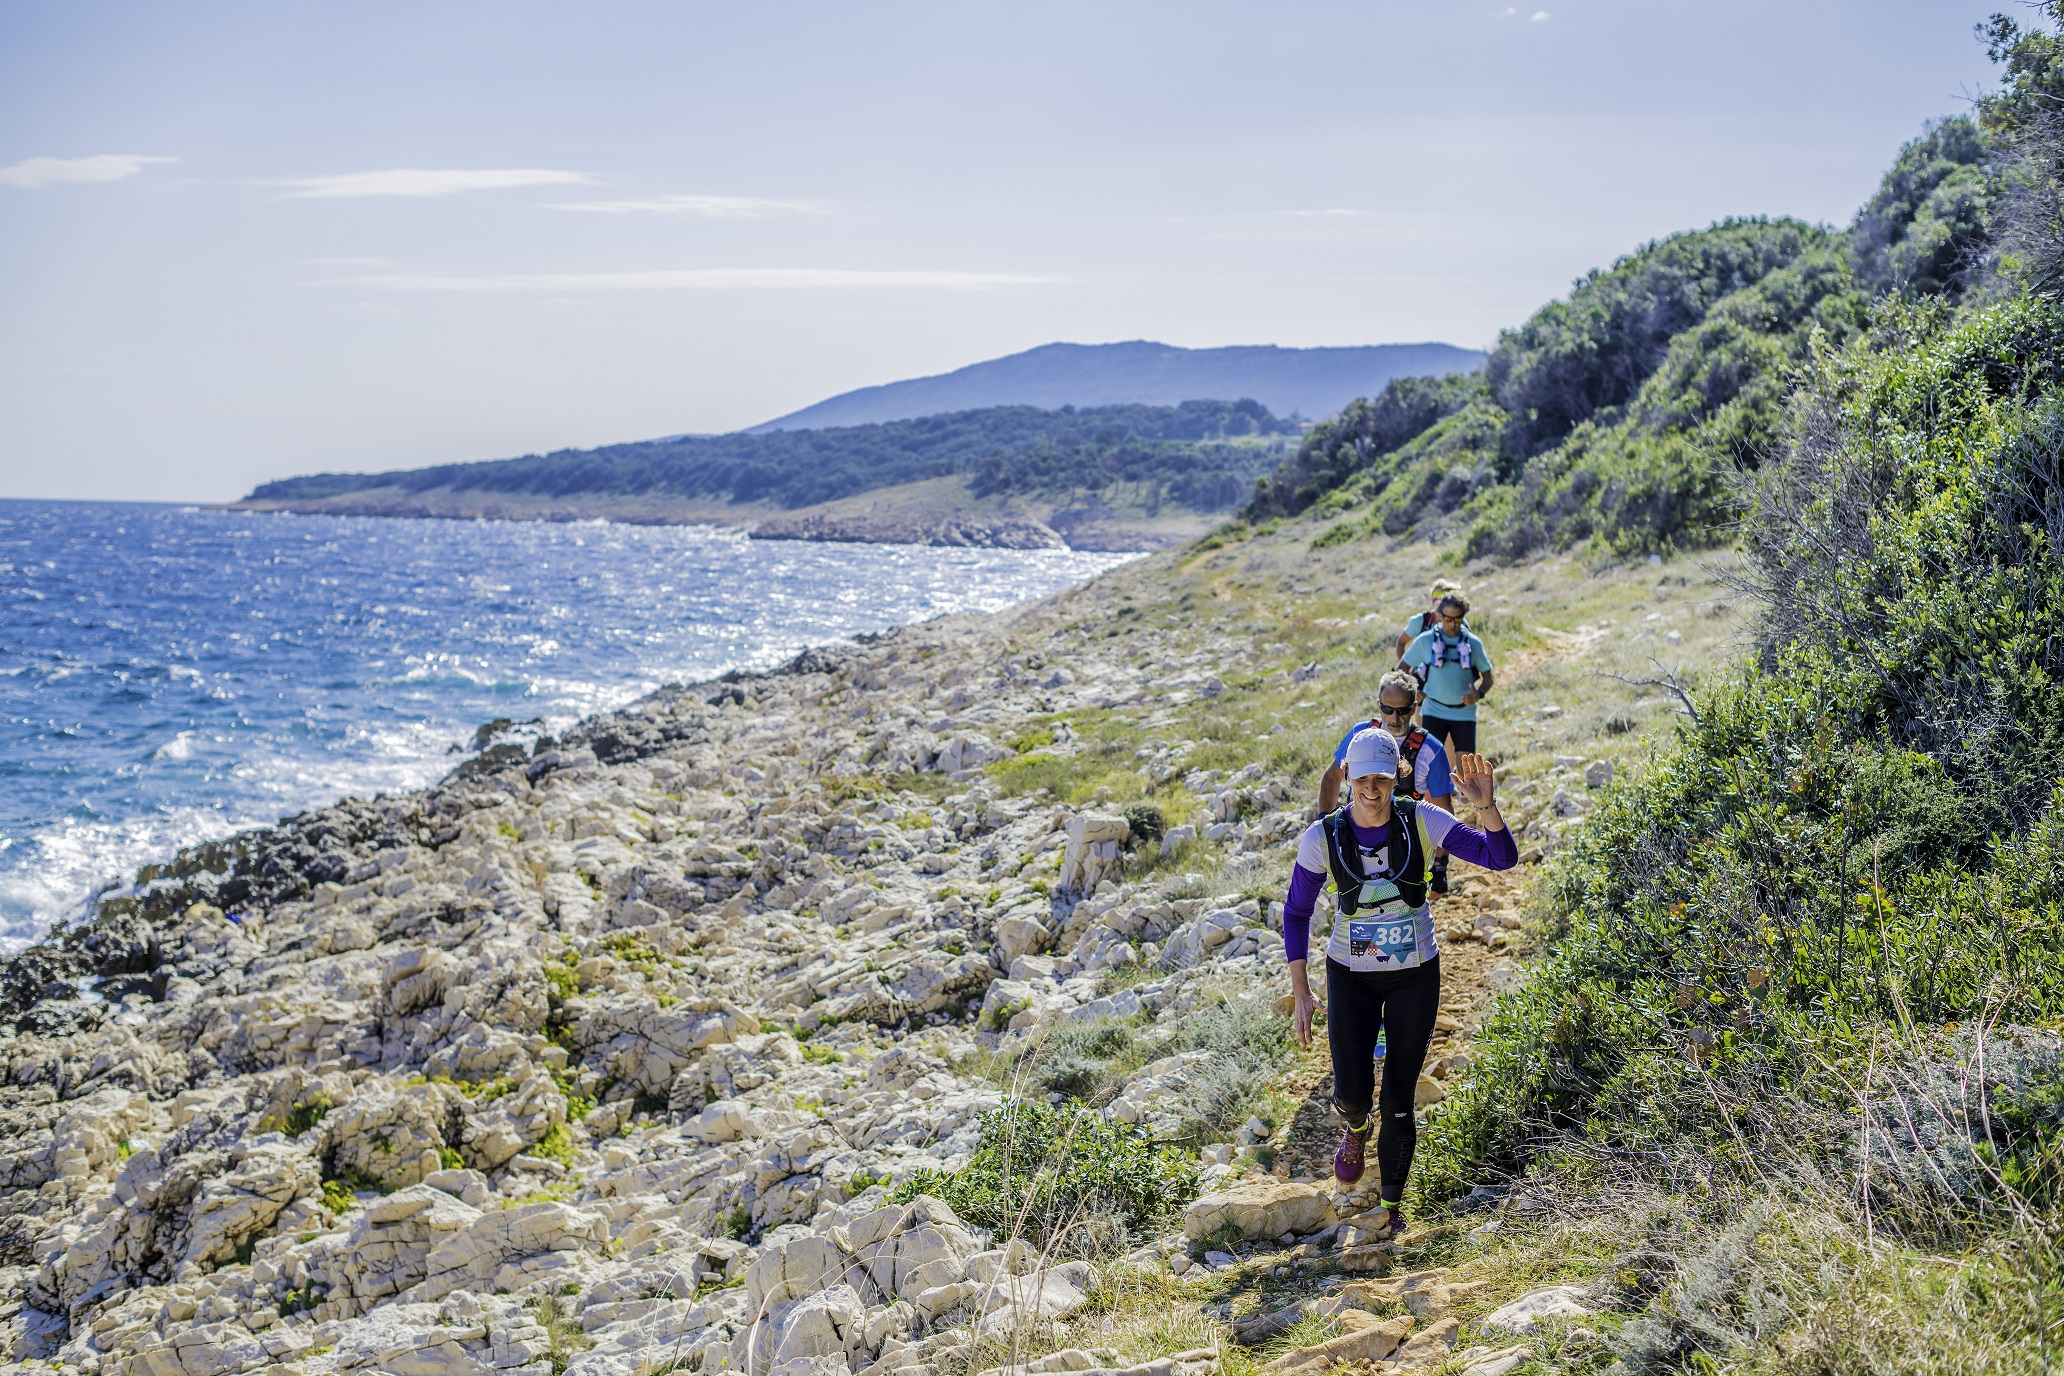 Valamar Trail 2018 (1).jpg (1.36 MB)